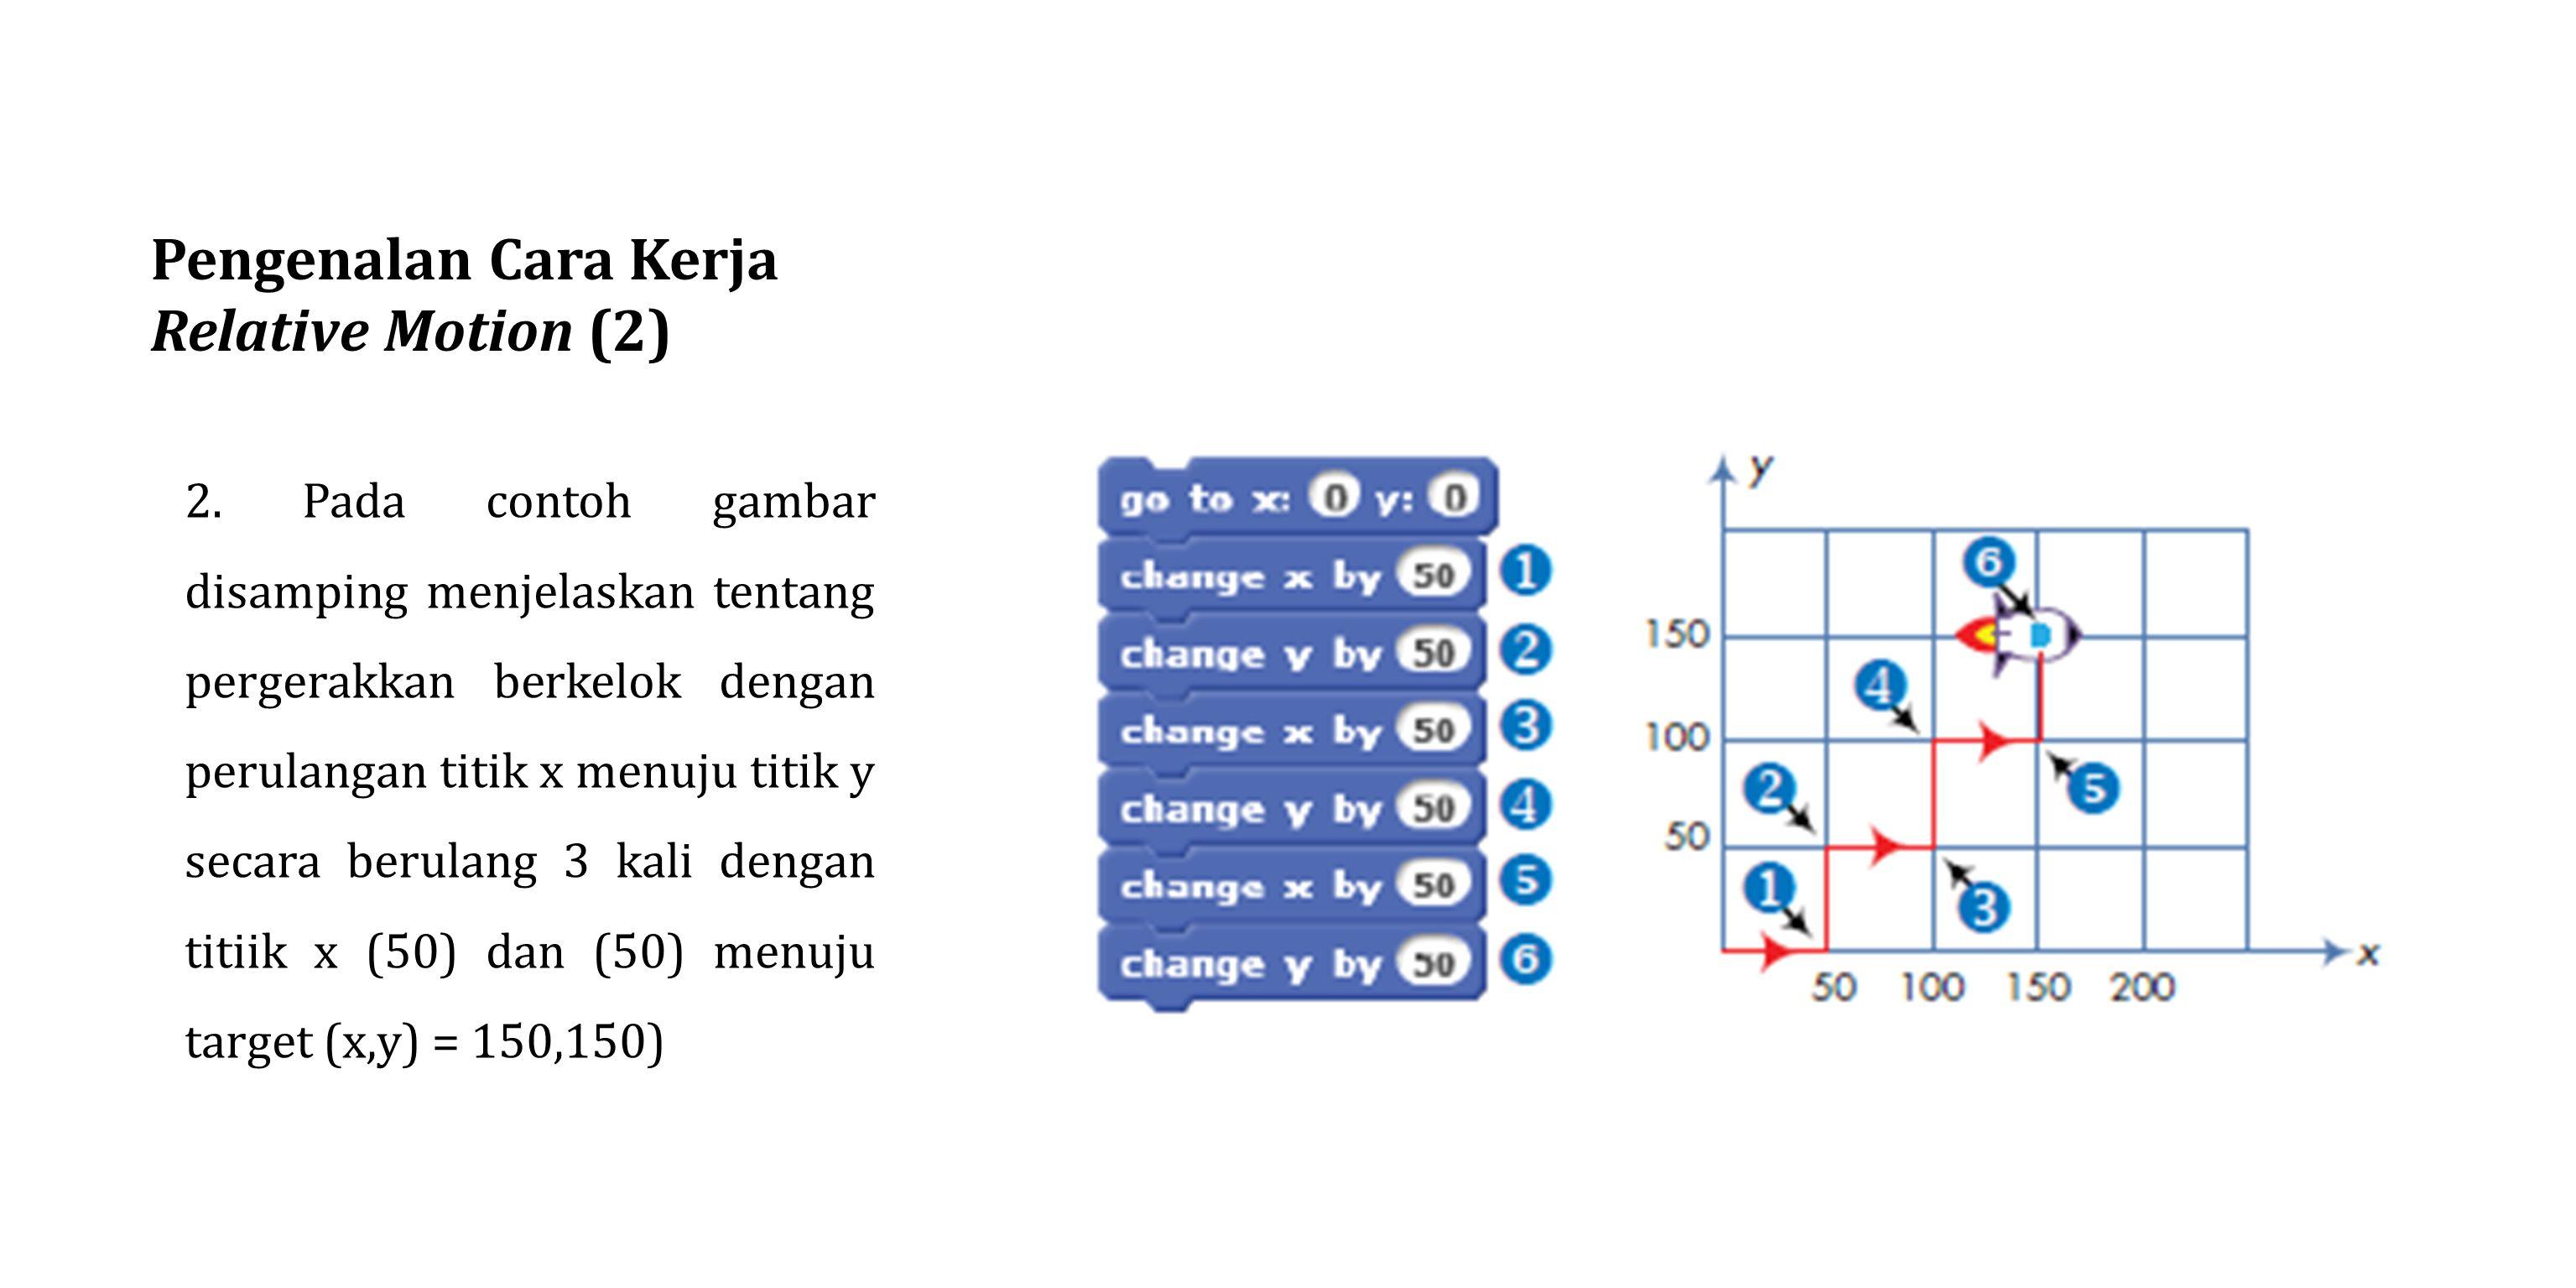 Pengenalan Cara Kerja Relative Motion (2) 2. Pada contoh gambar disamping menjelaskan tentang pergerakkan berkelok dengan perulangan titik x menuju ti